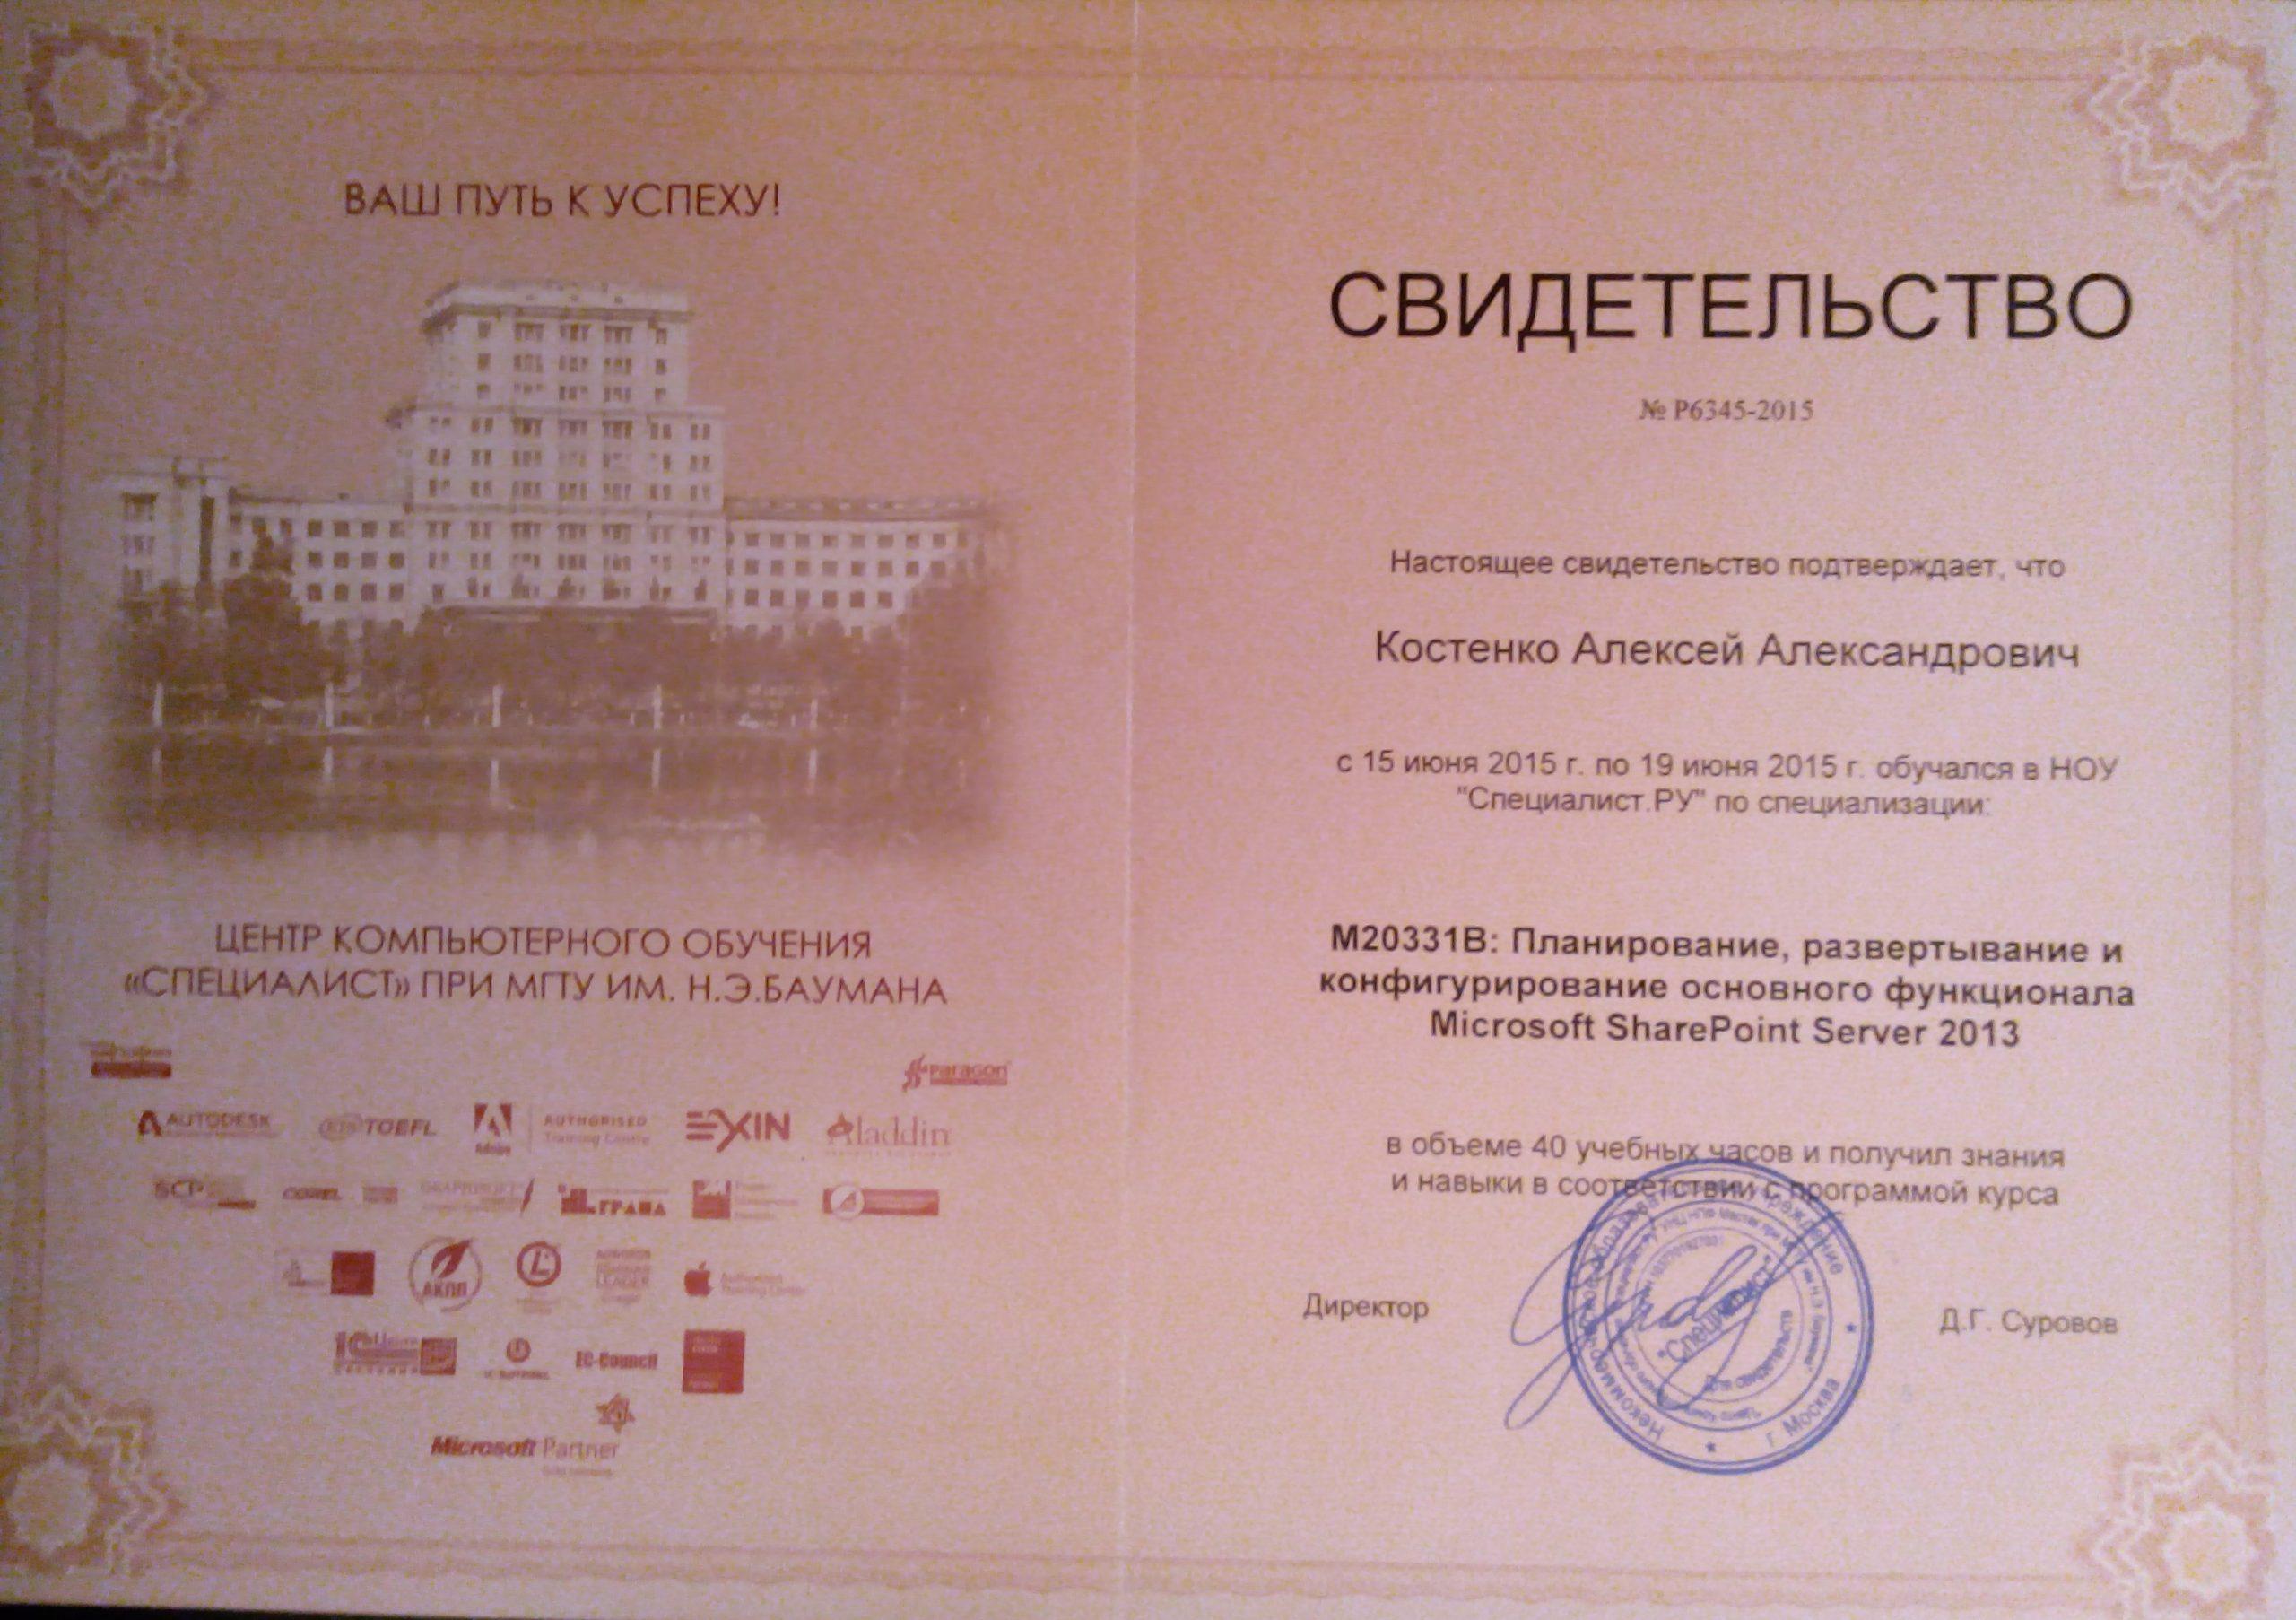 MS Sharepoint 2013 - Алексей Костенко